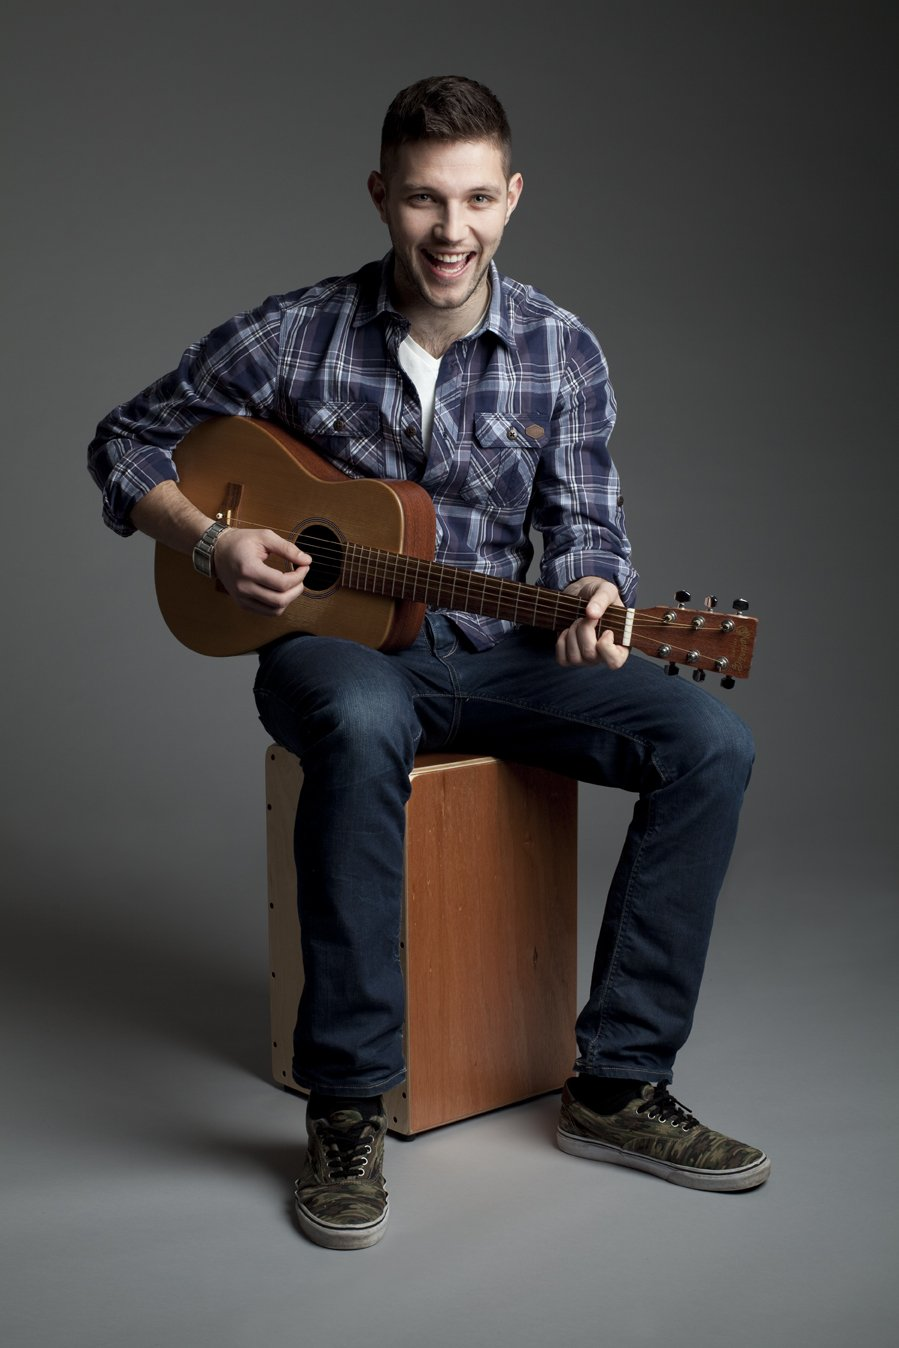 Colm Keegan – Baby Martin Guitar 2